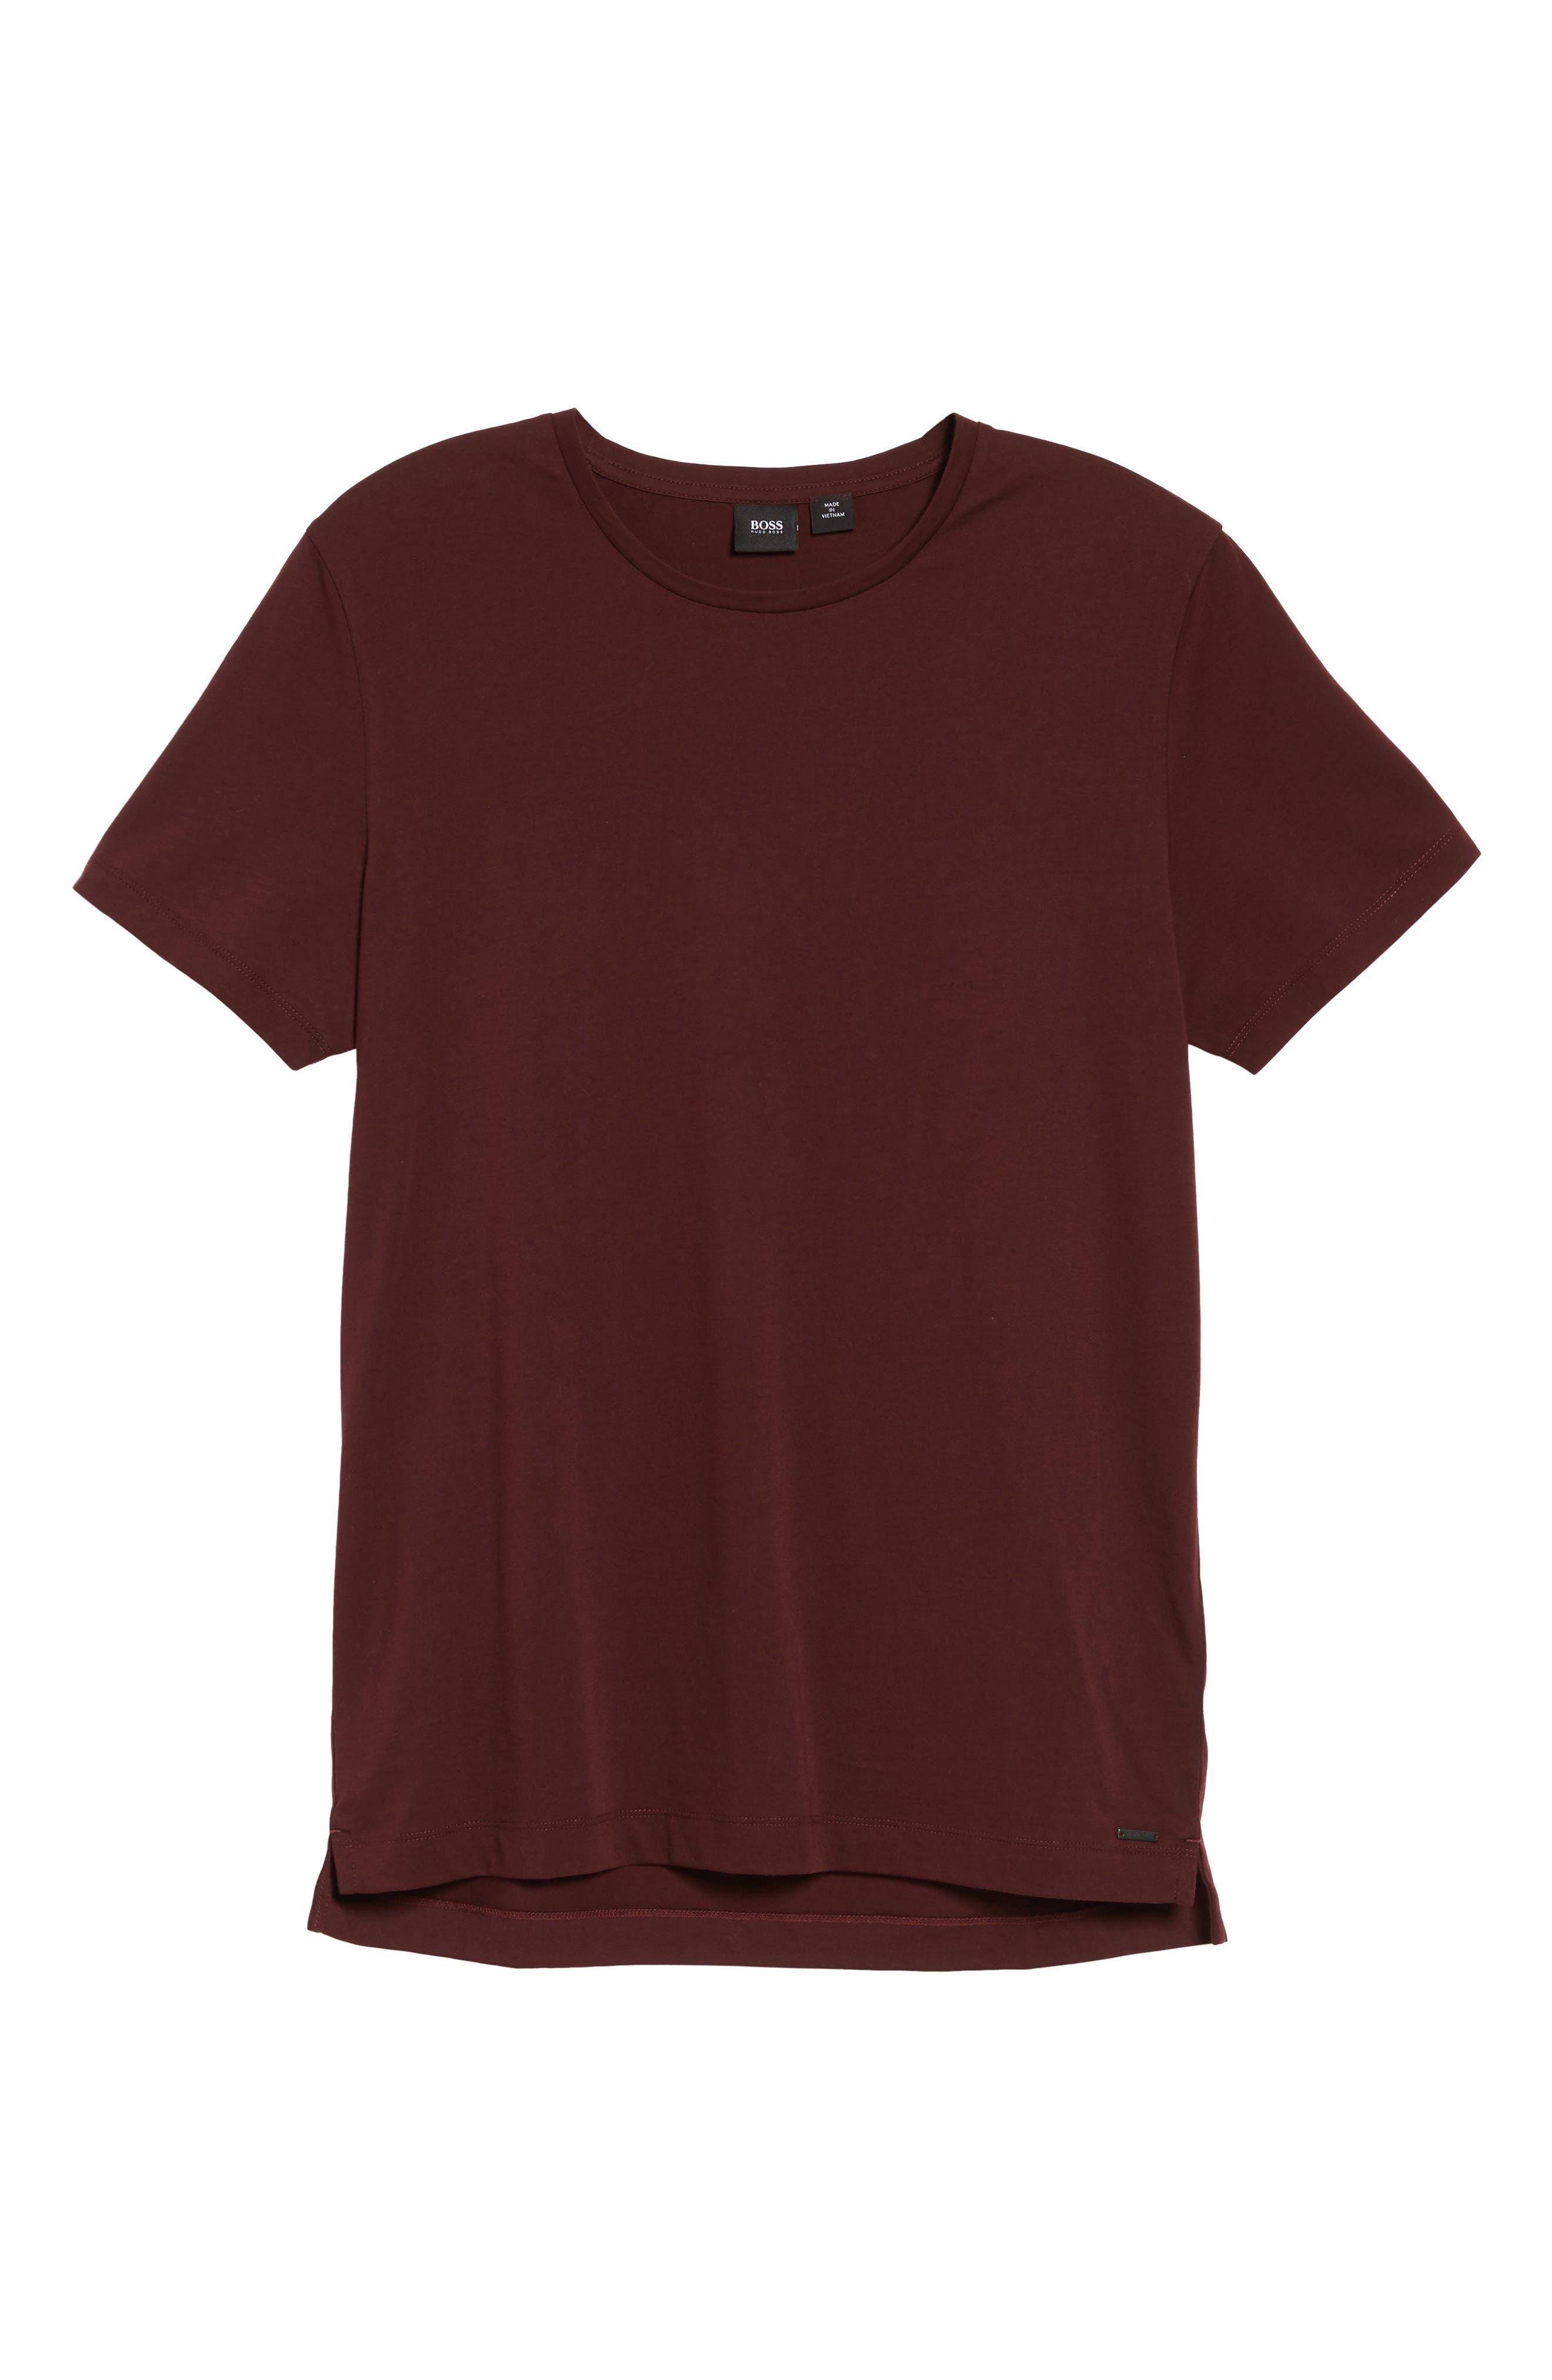 Tessler Crewneck T-Shirt,                             Alternate thumbnail 10, color,                             Black